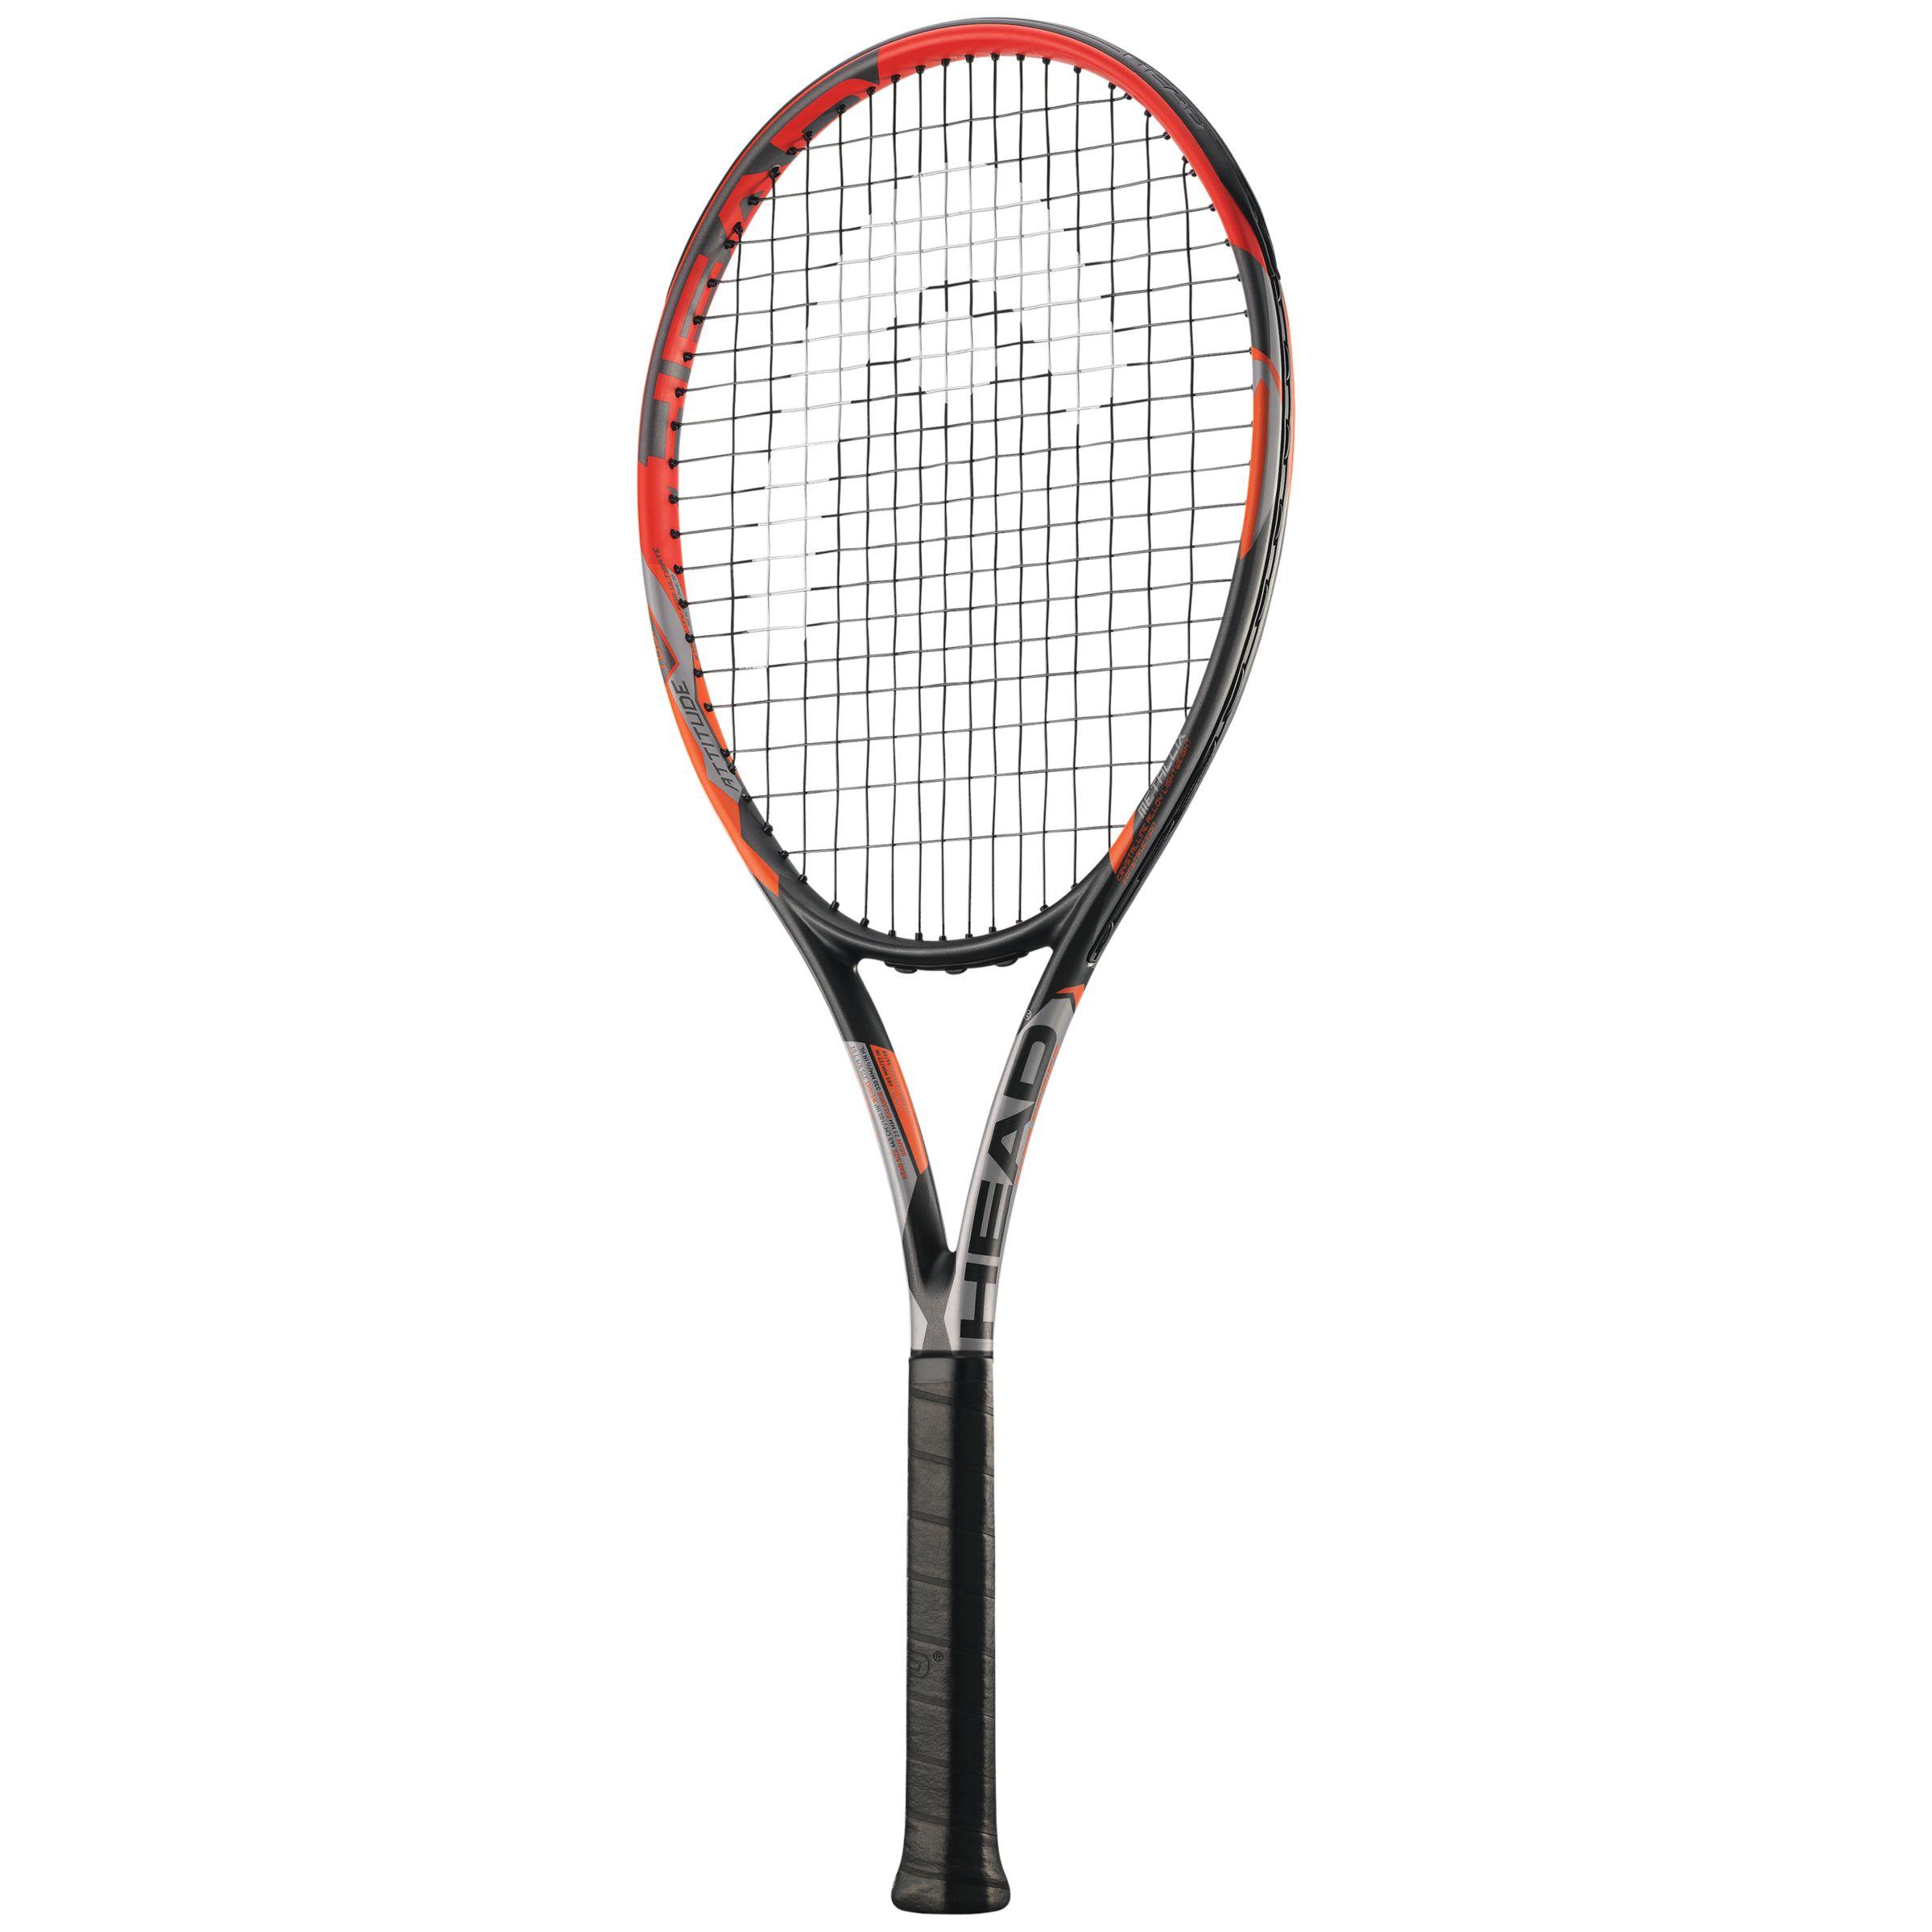 Head Head Attitude Tour Adult Tennis Racket, Orange